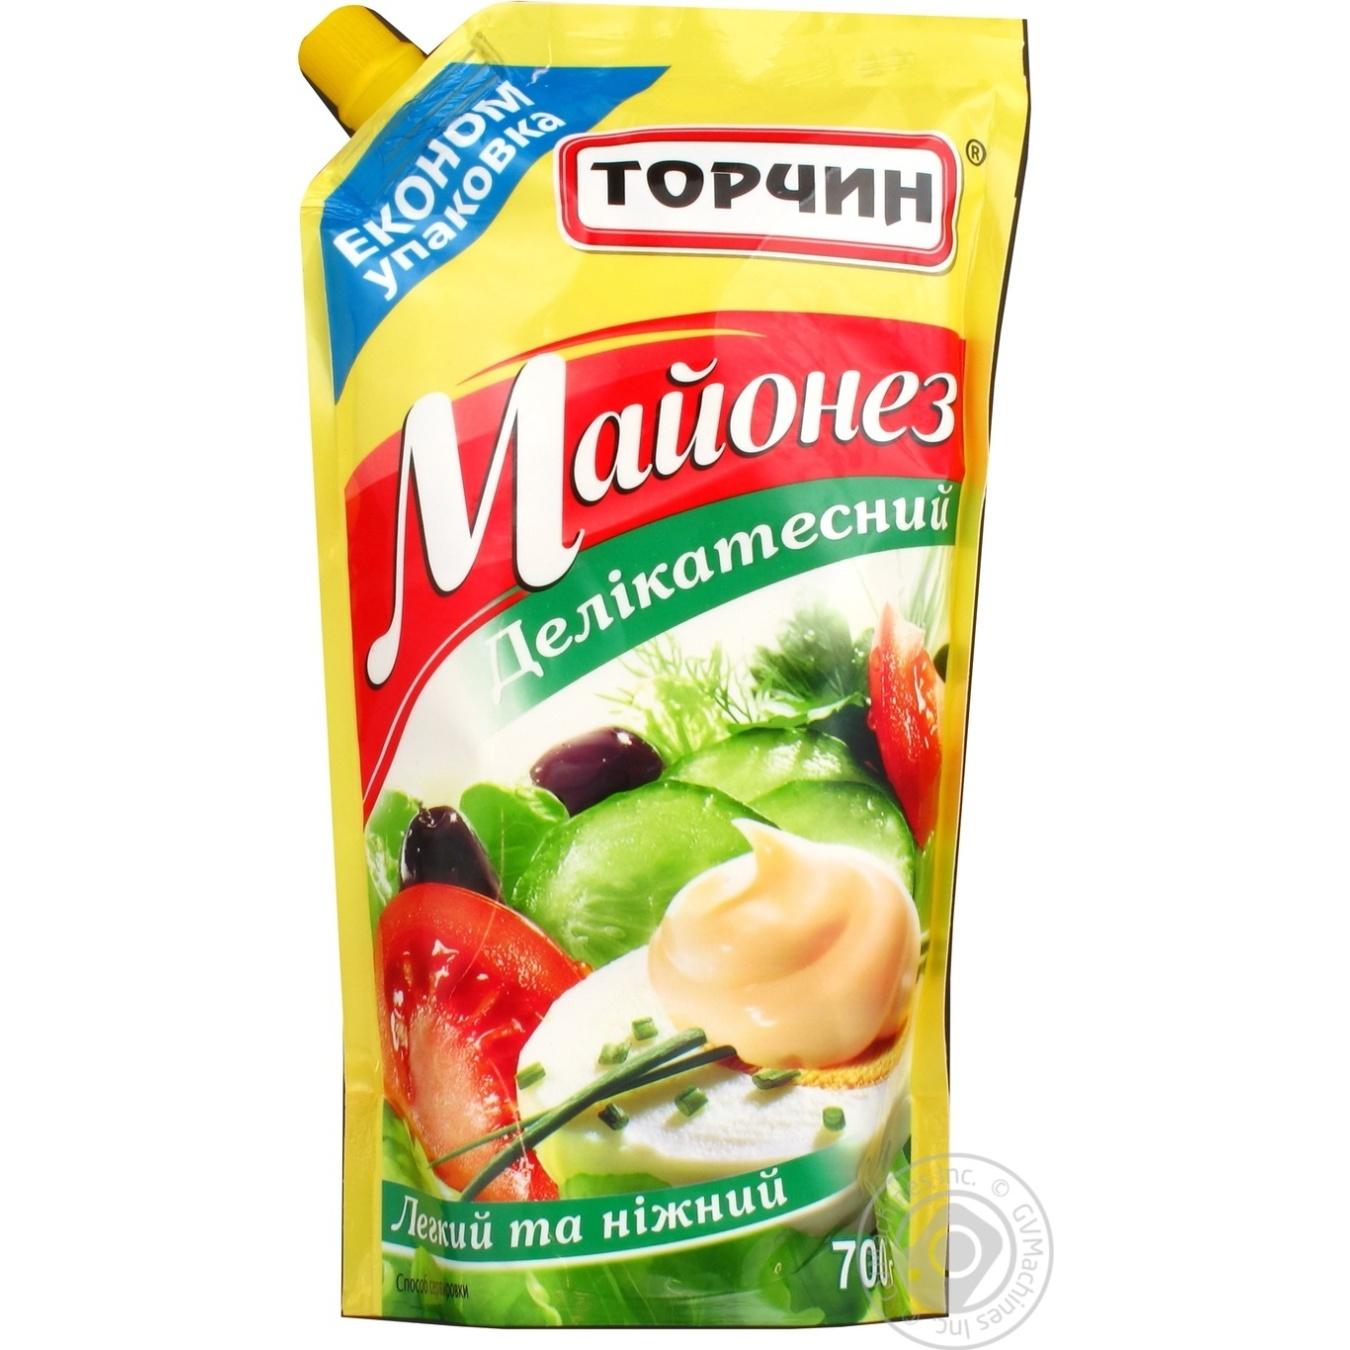 onnaise torchin delicatessen % g doypack ukraine rarr canned onnaise torchin delicatessen 30% 700g doypack ukraine